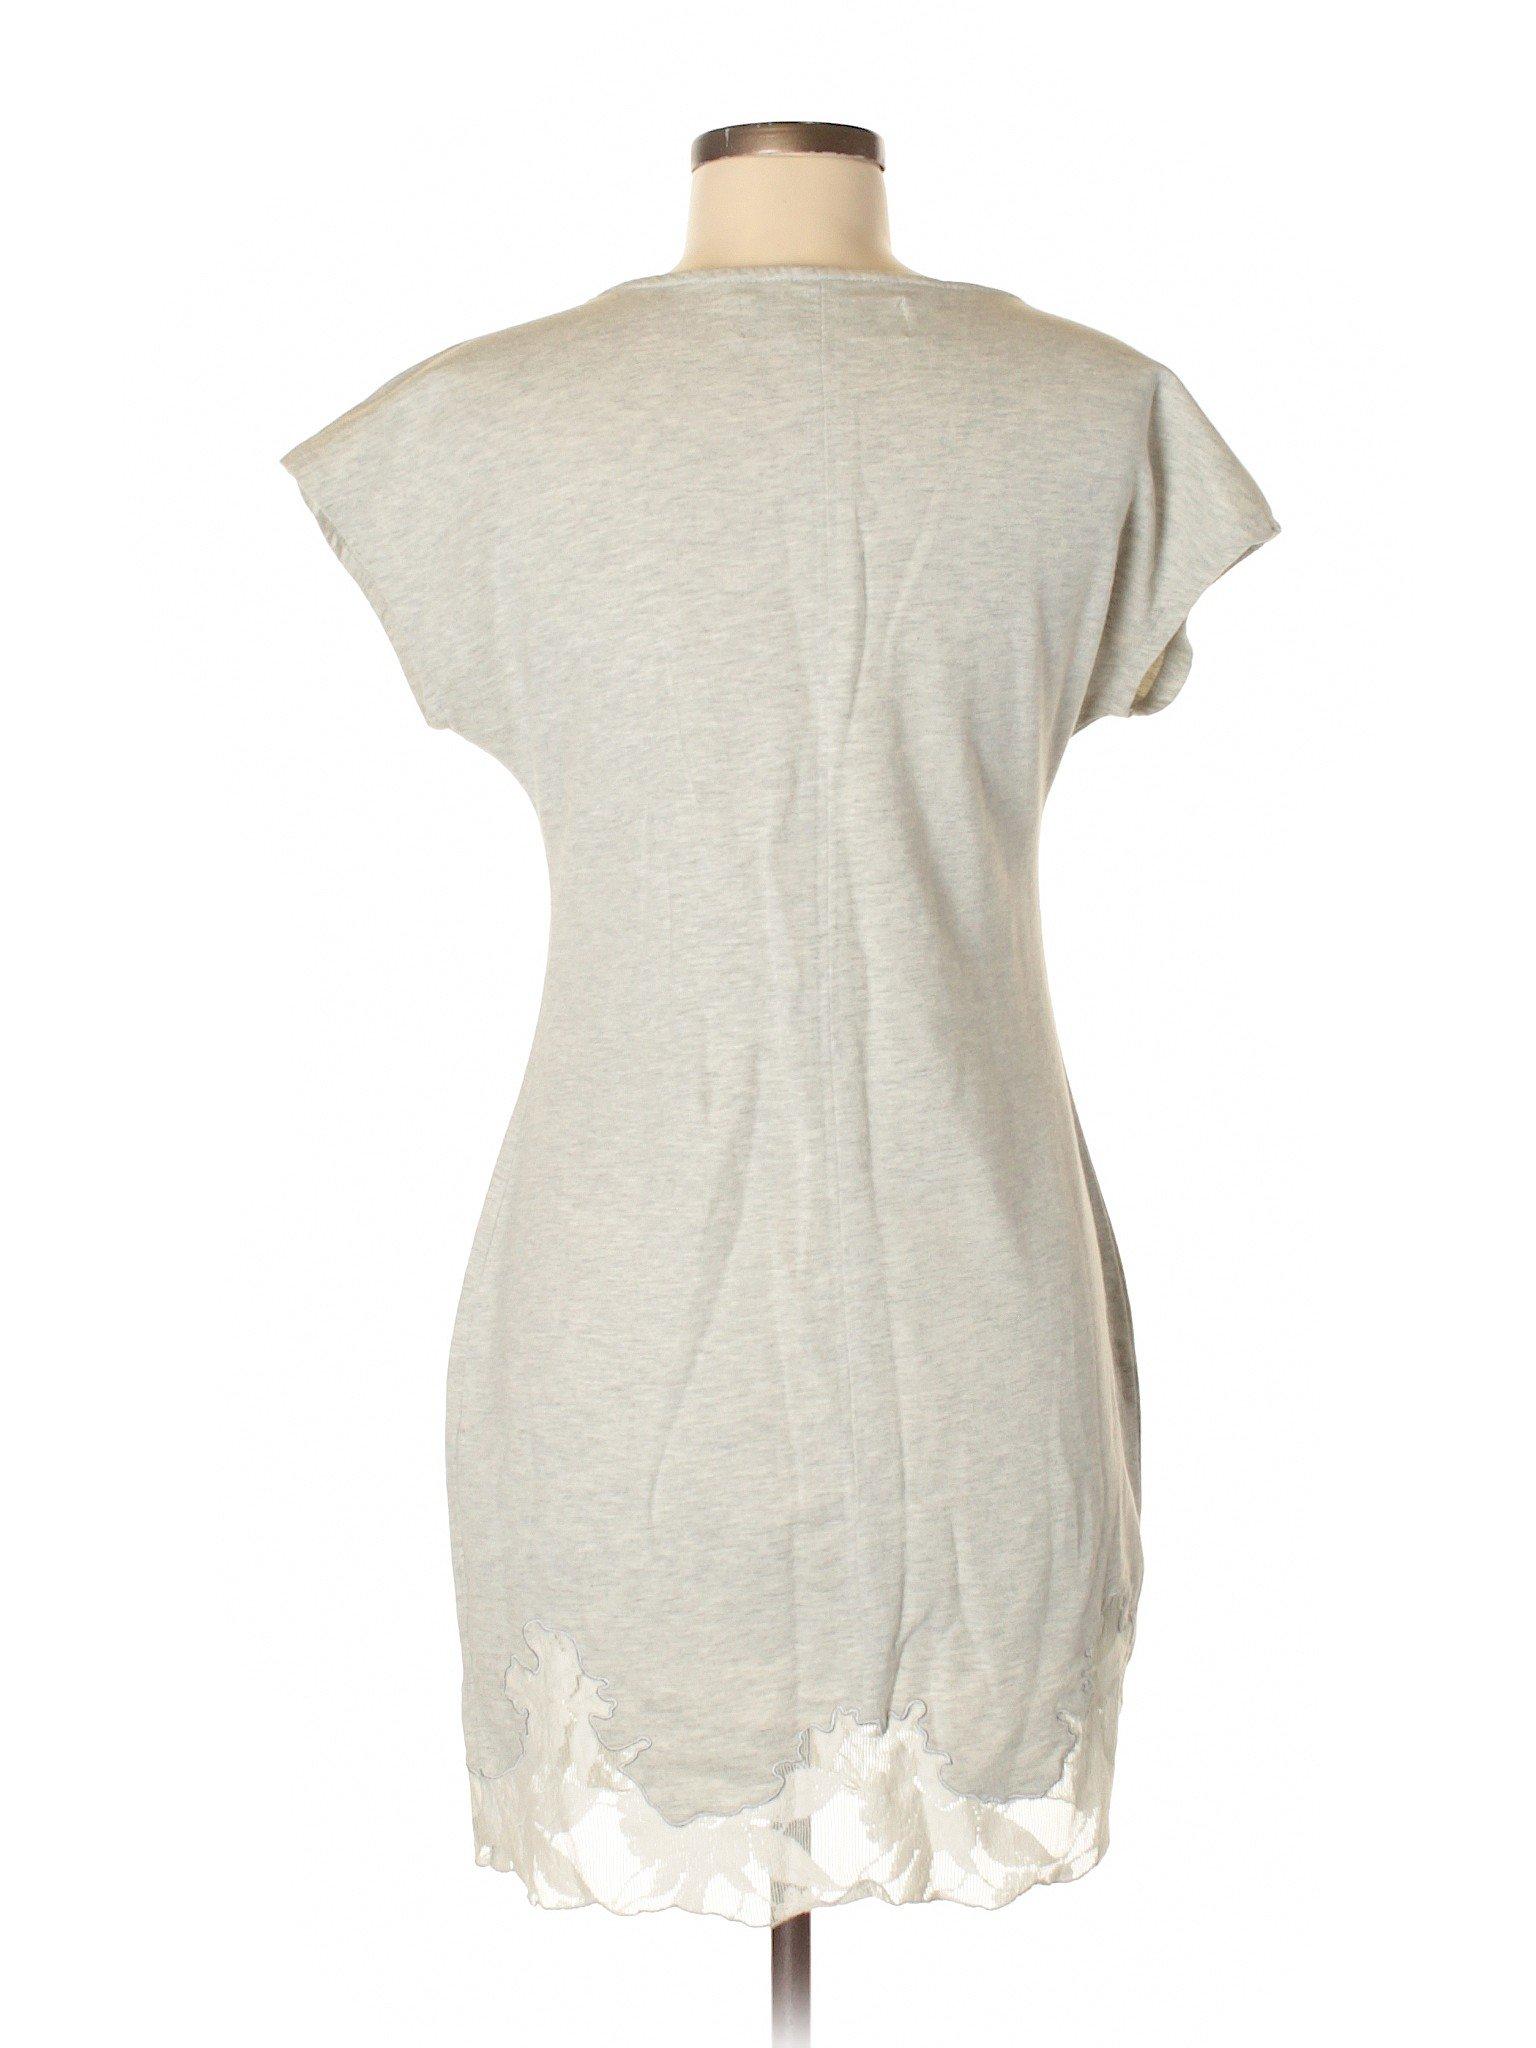 Dress Collection Zara Boutique winter Casual wBq77aI